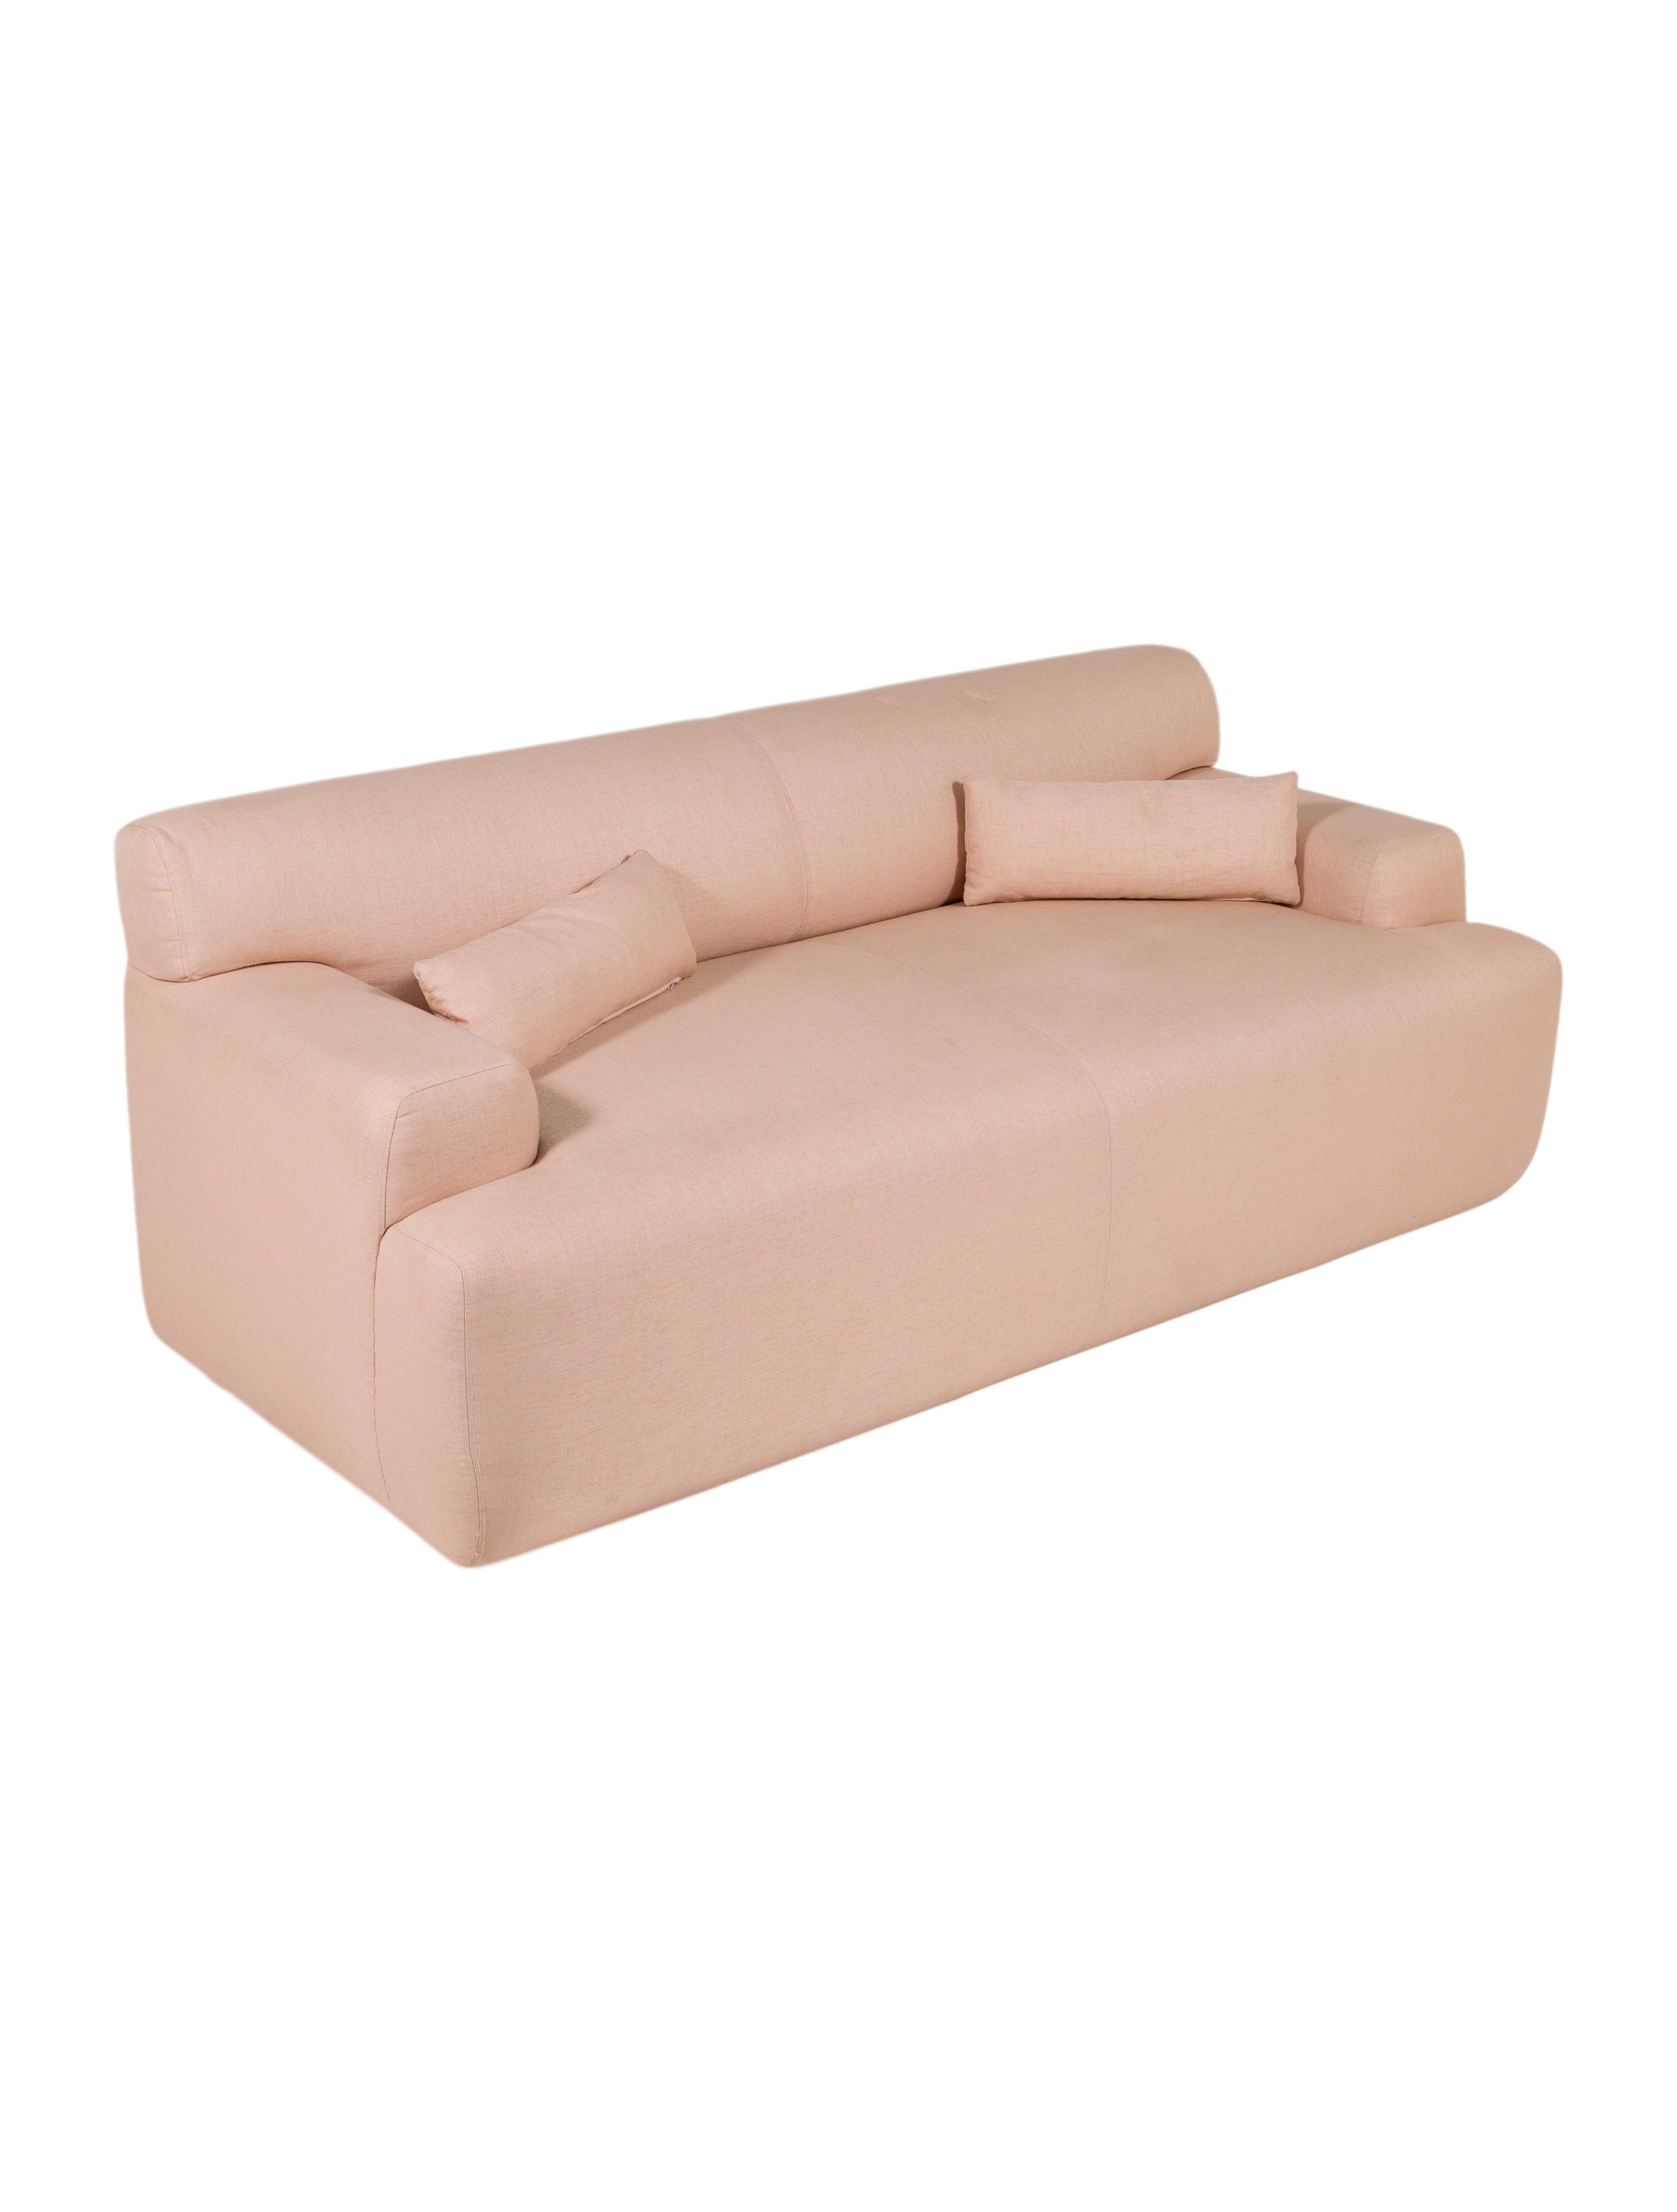 J. Alexander Upholstered Sofa